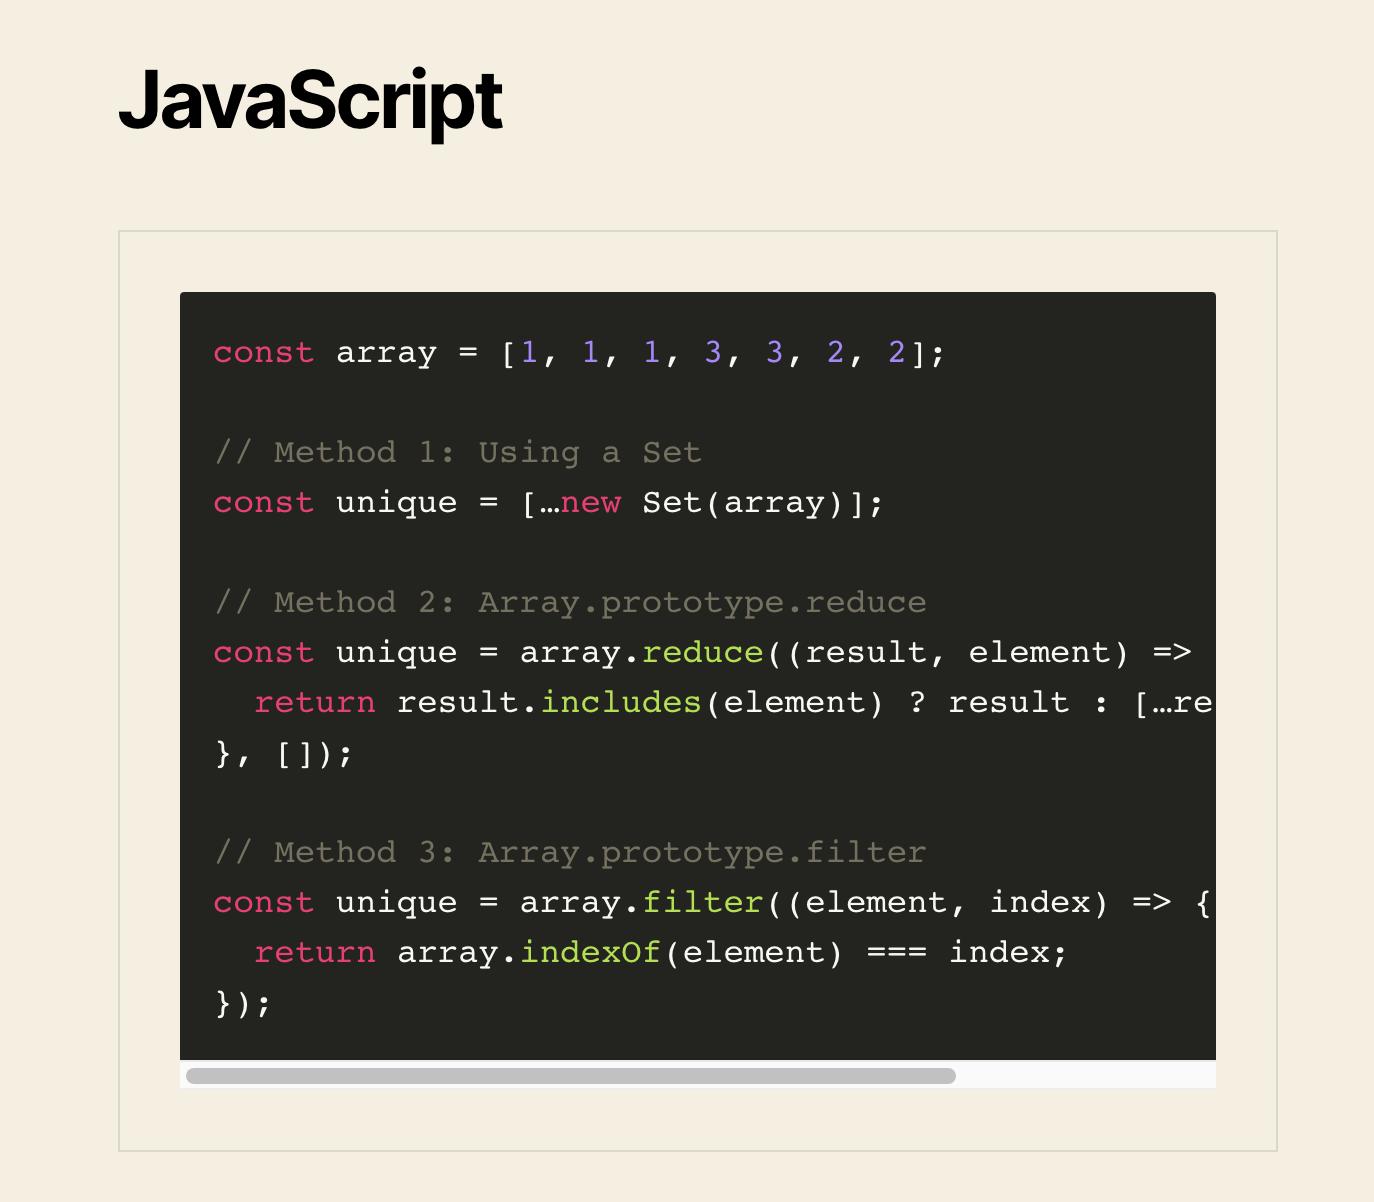 Sublime (Monokai) Theme: JavaScript Snippet